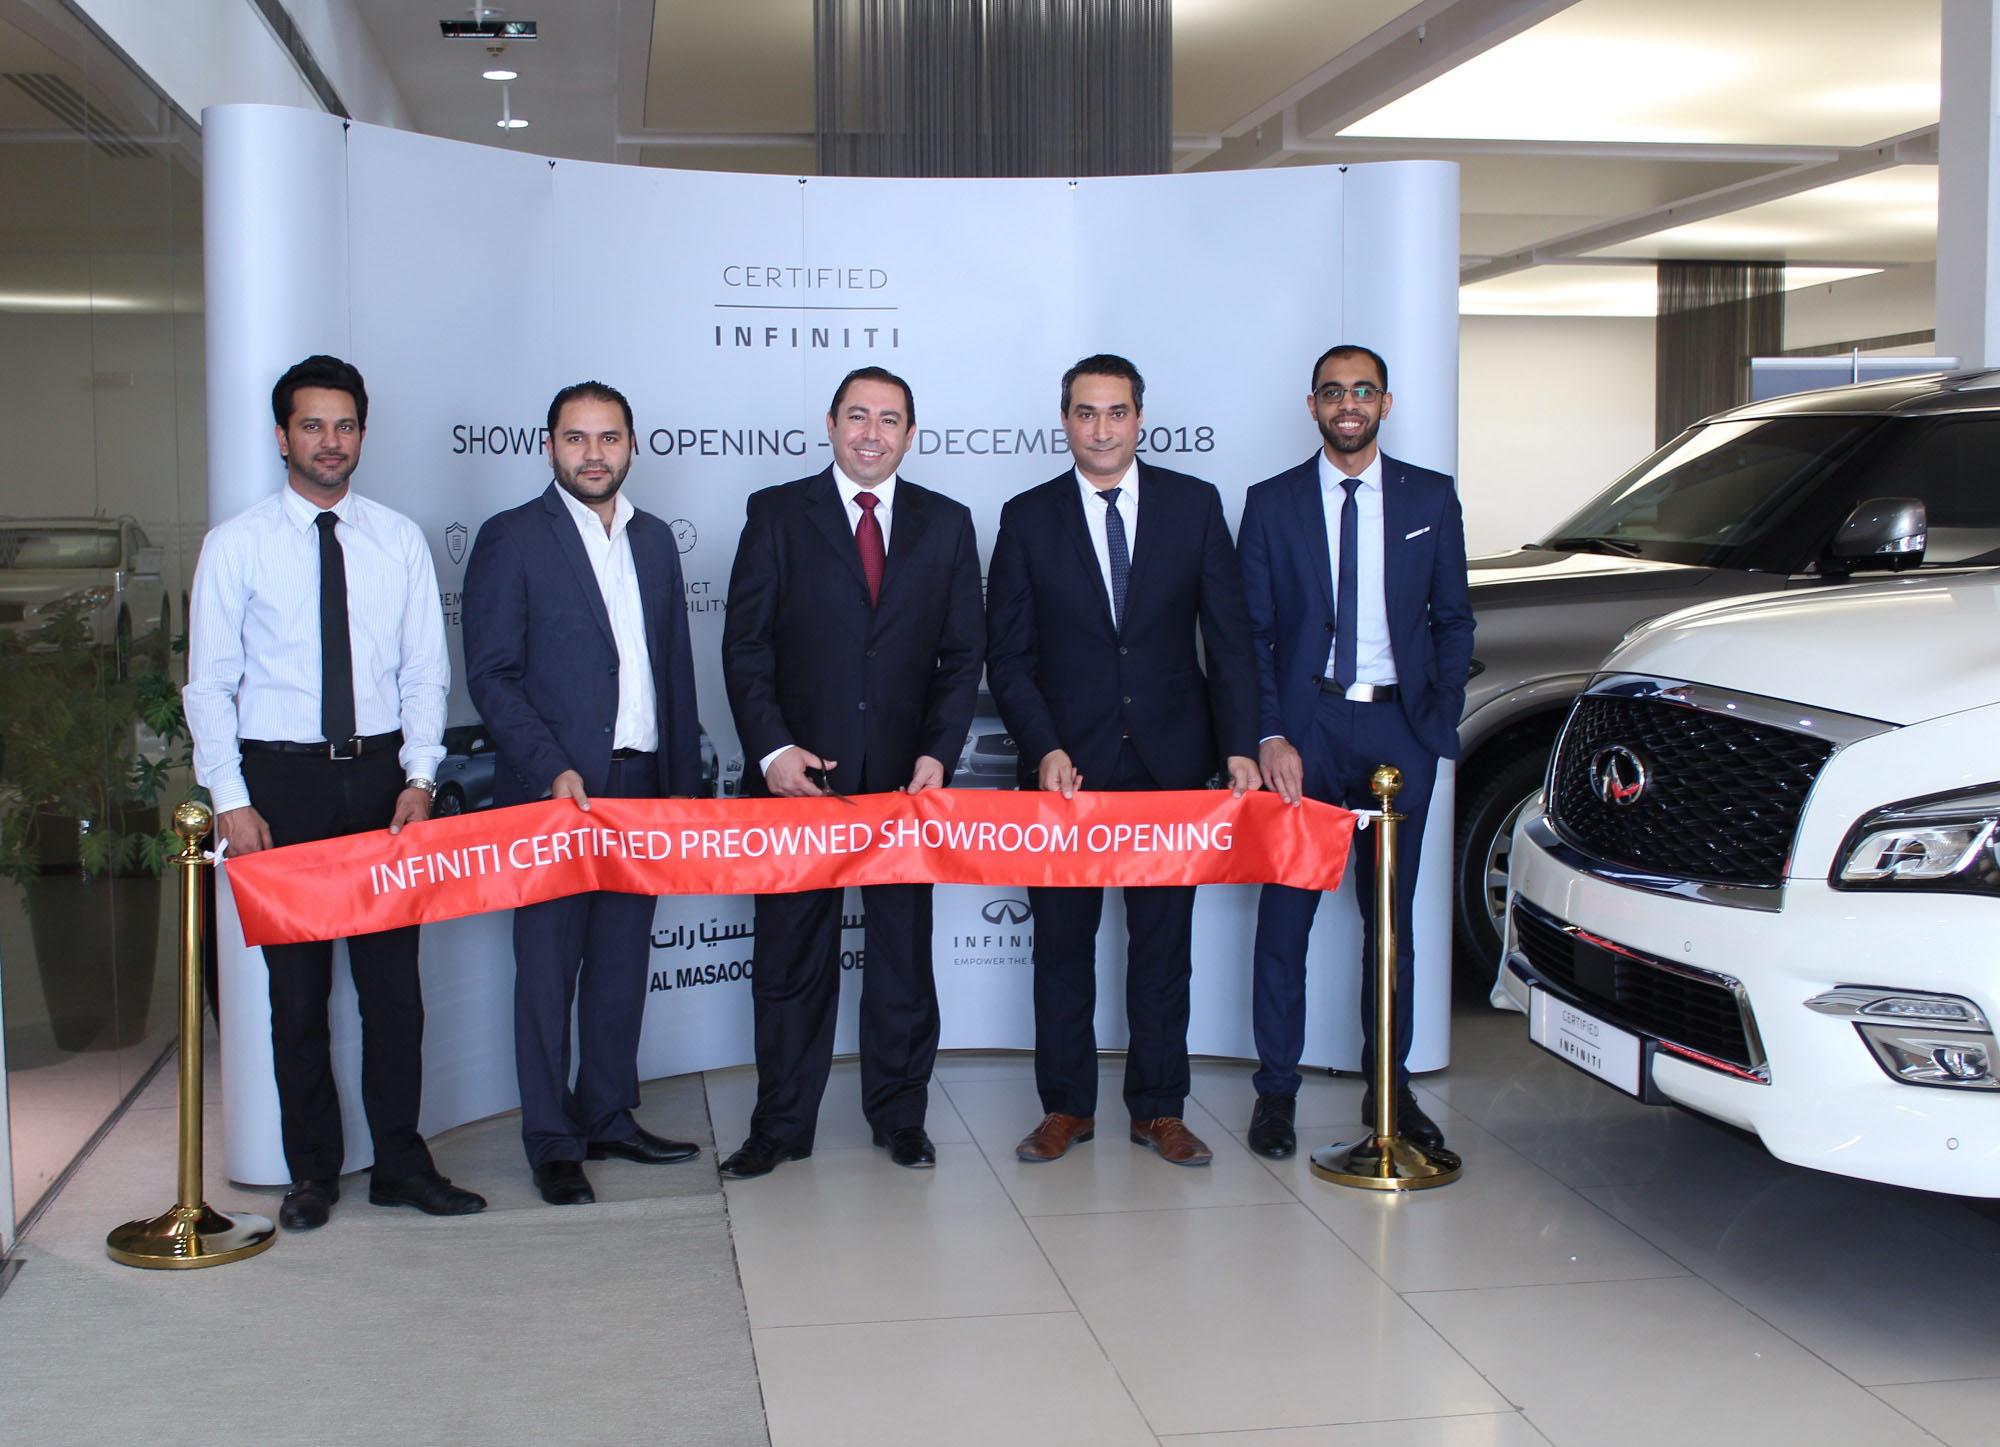 Al Masaood Automobiles Opens Pre-owned Infiniti Showroom in Abu Dhabi